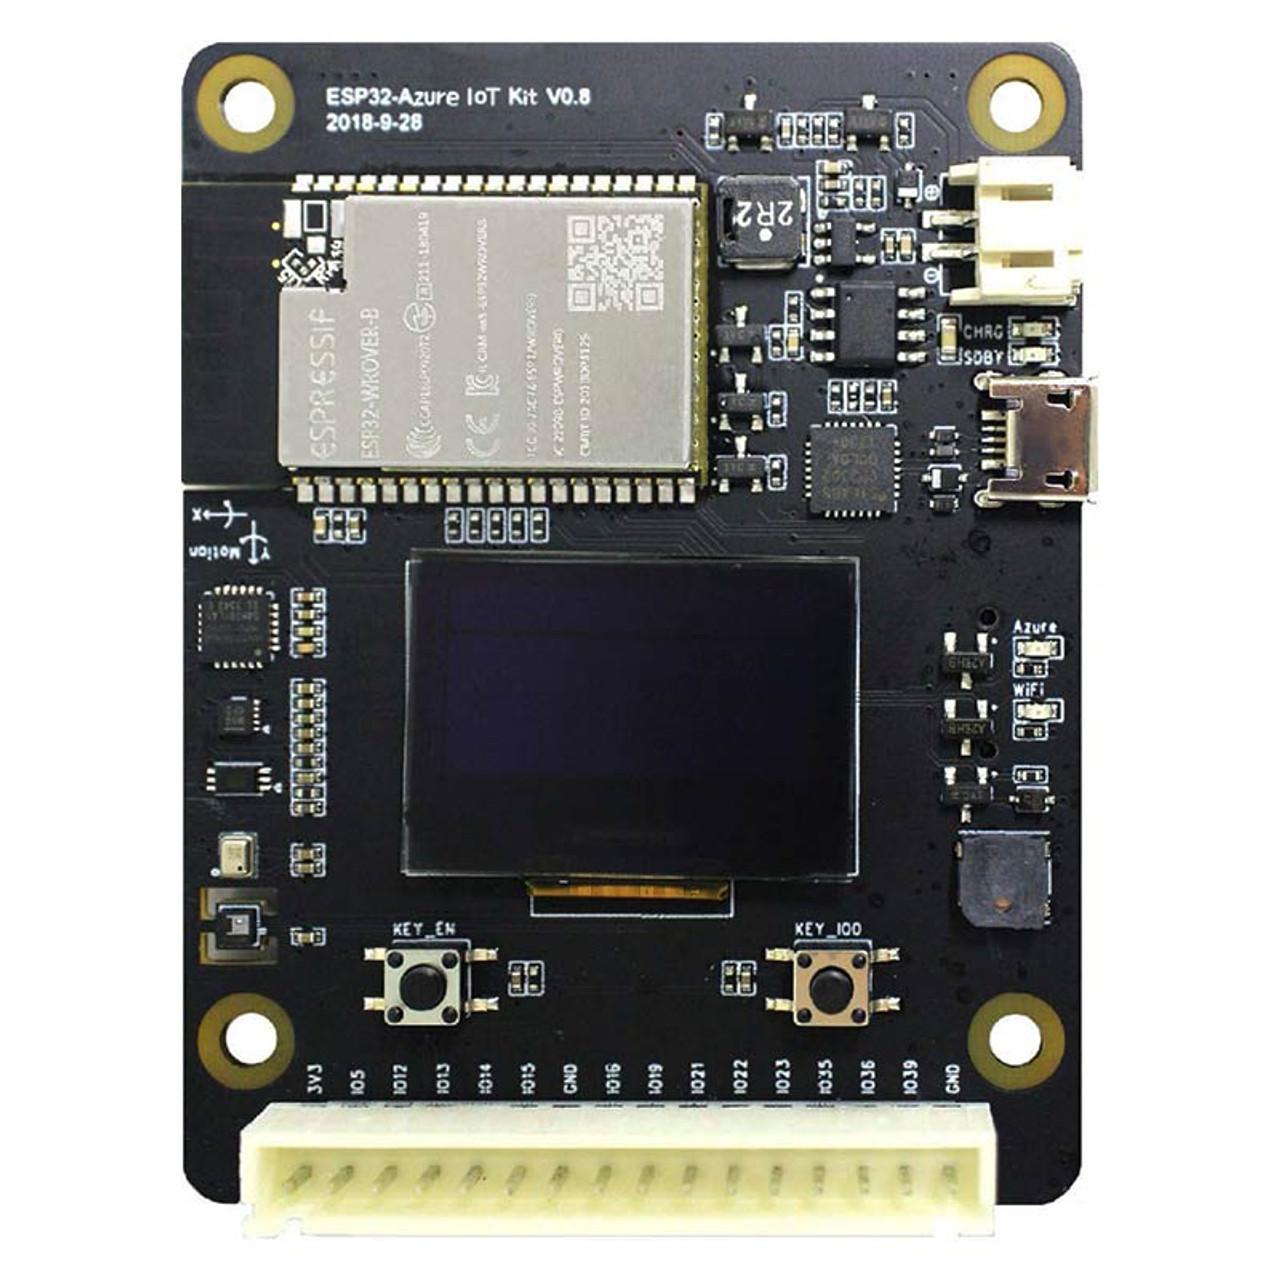 ESP32 Wi-Fi BT/BLE Sensor IoT Development Board